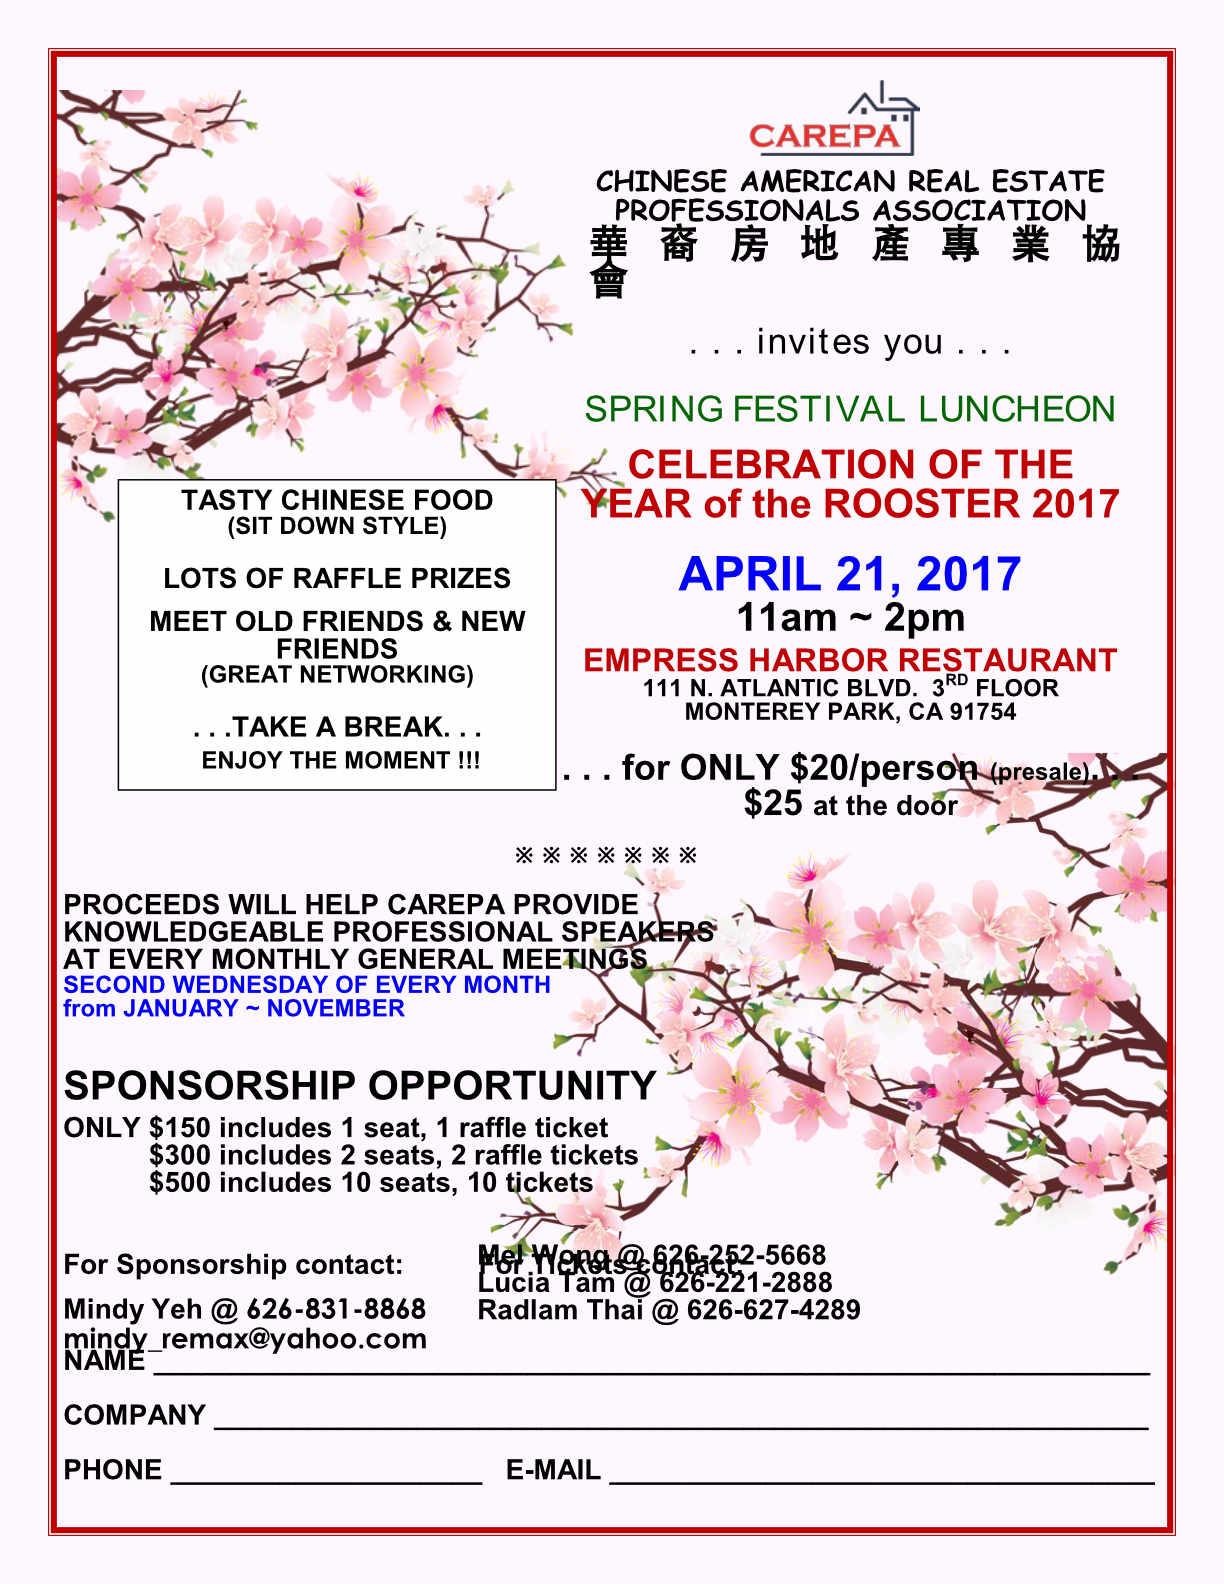 CAREPA Spring Festival 2017